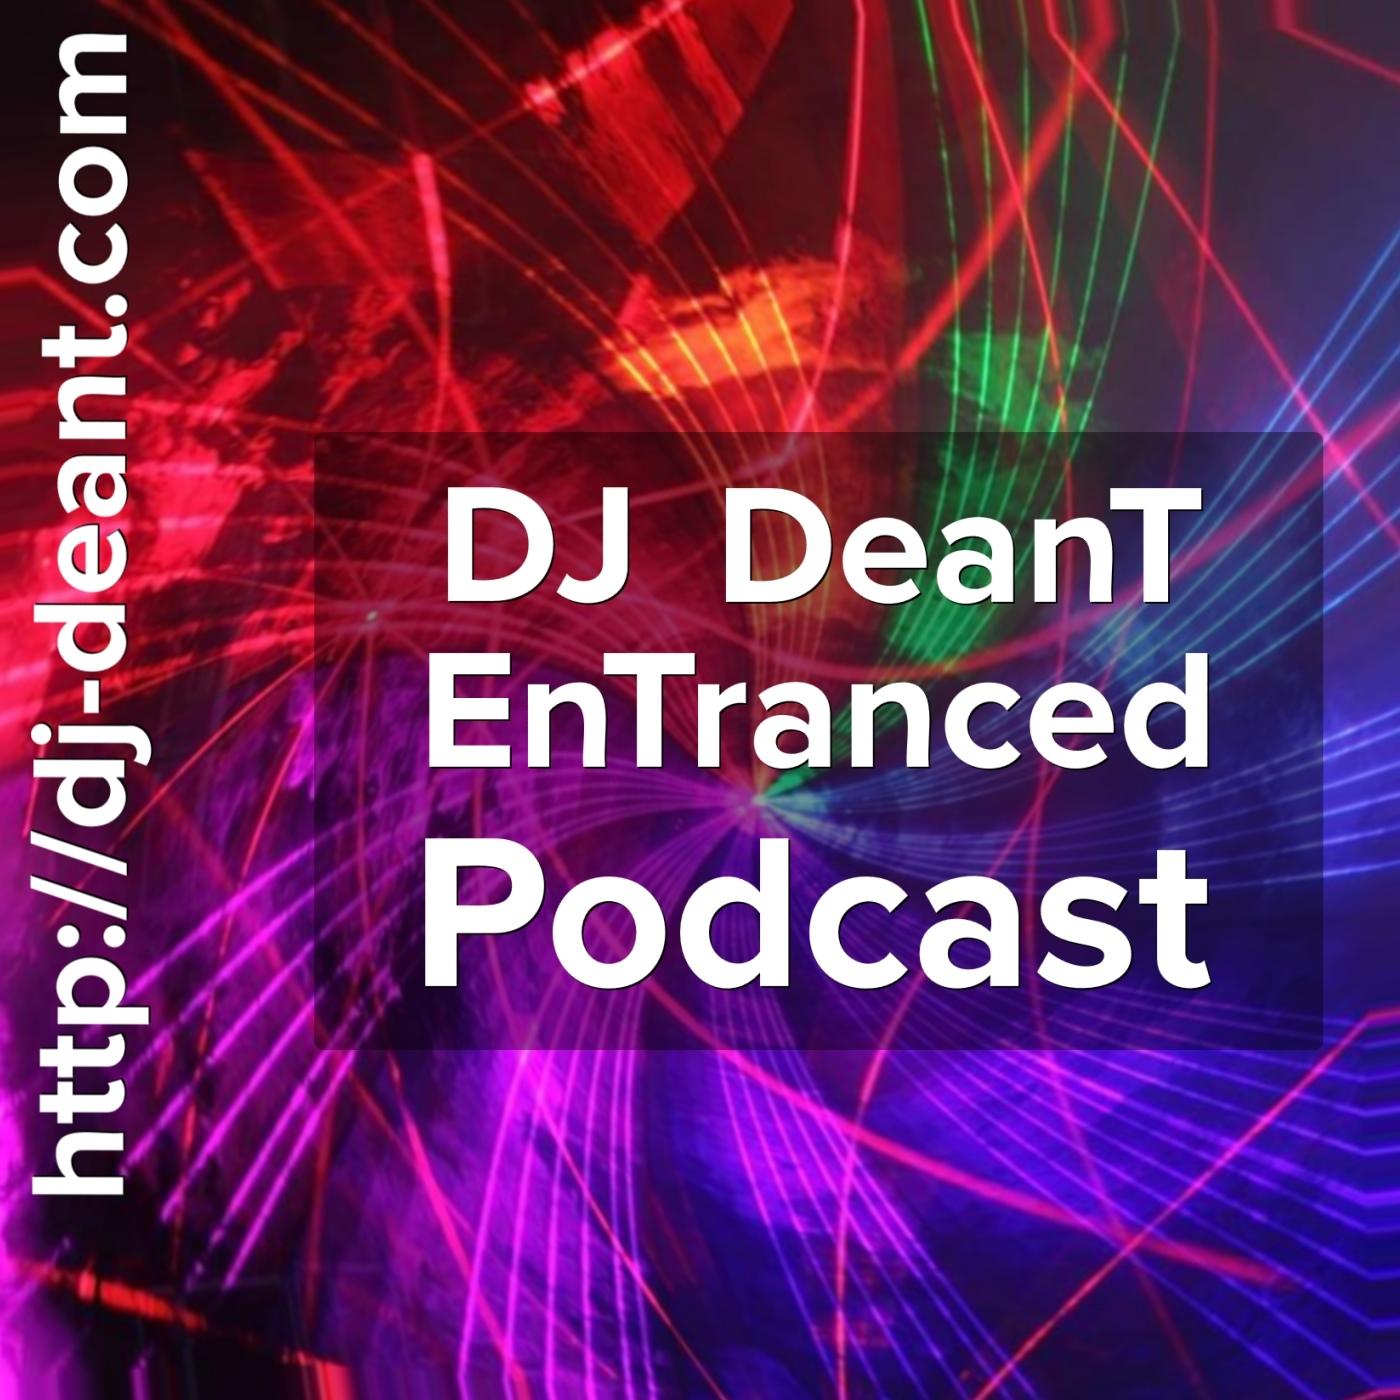 DJ DeanT EnTranced Podcast